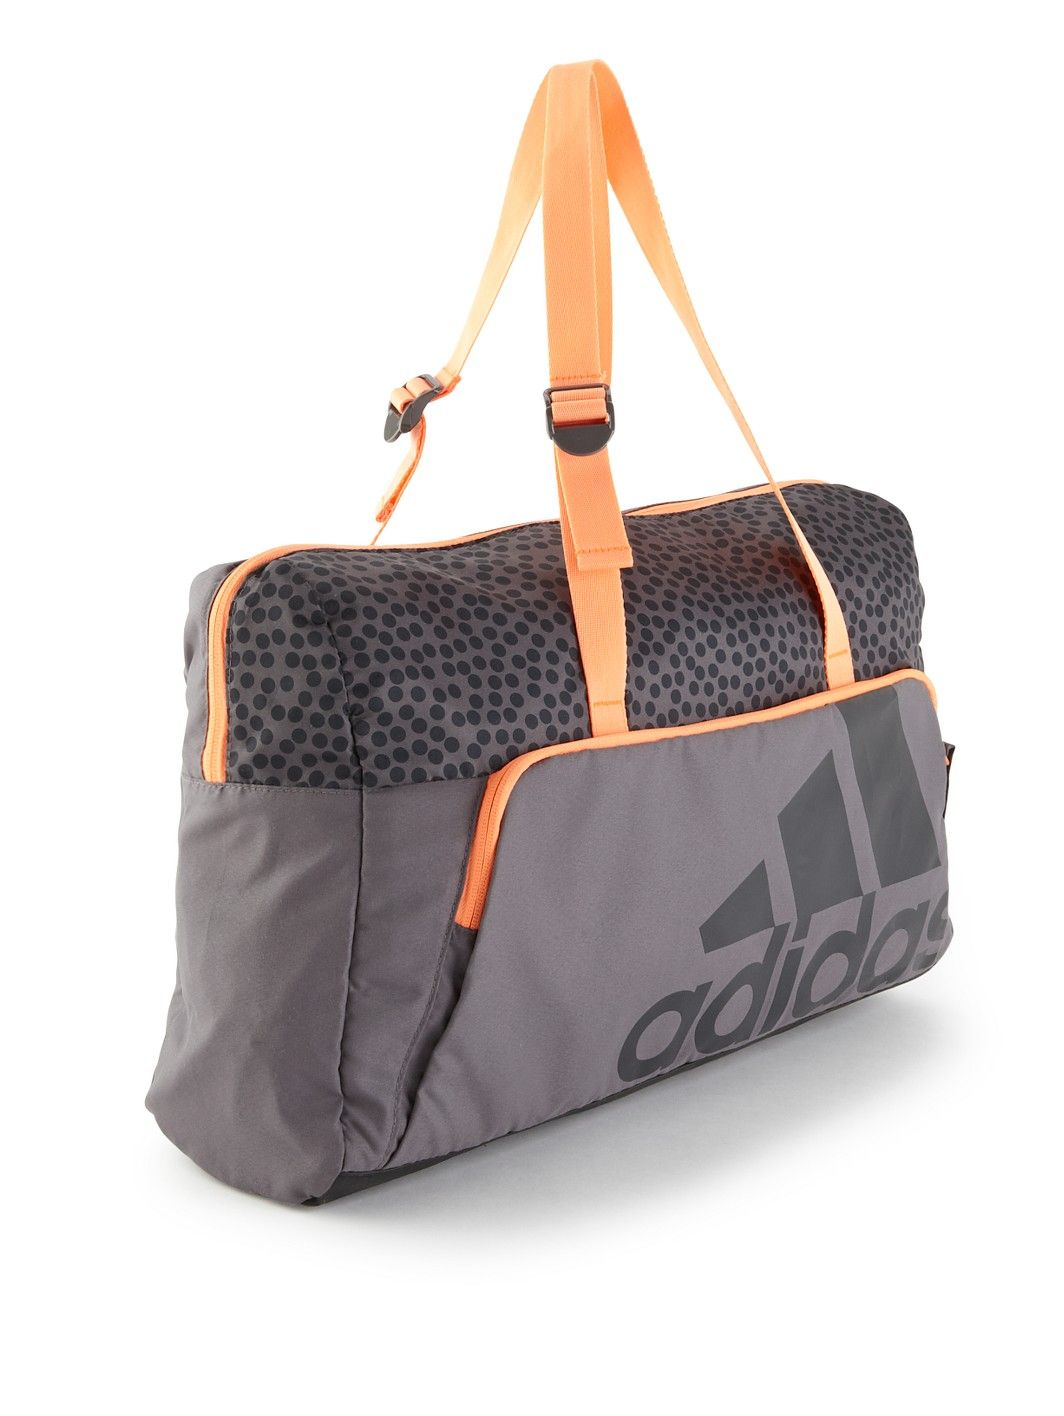 8a4d89b92 Some kind of cute gym bag! :) adidas Next Generation Medium Gym Bag |  very.co.uko